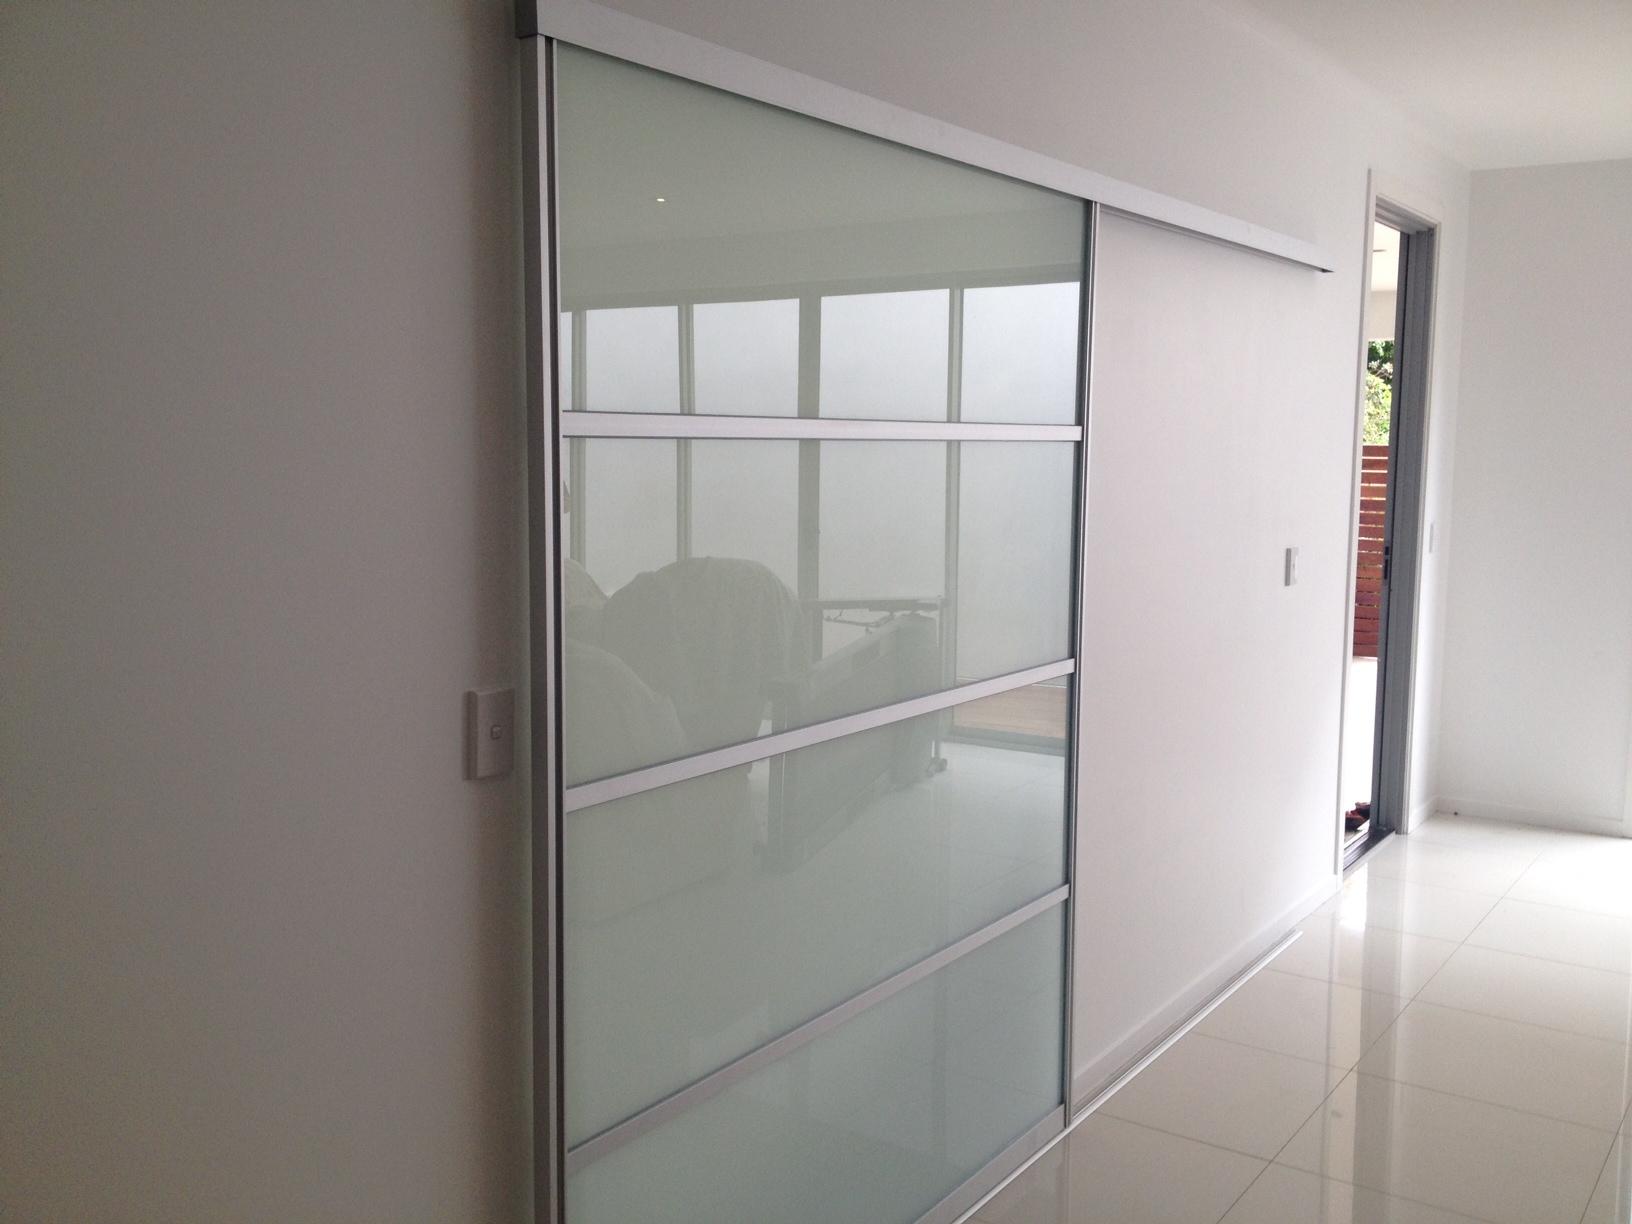 Top 15 interior door projects that belong in a magazine for Large internal sliding doors